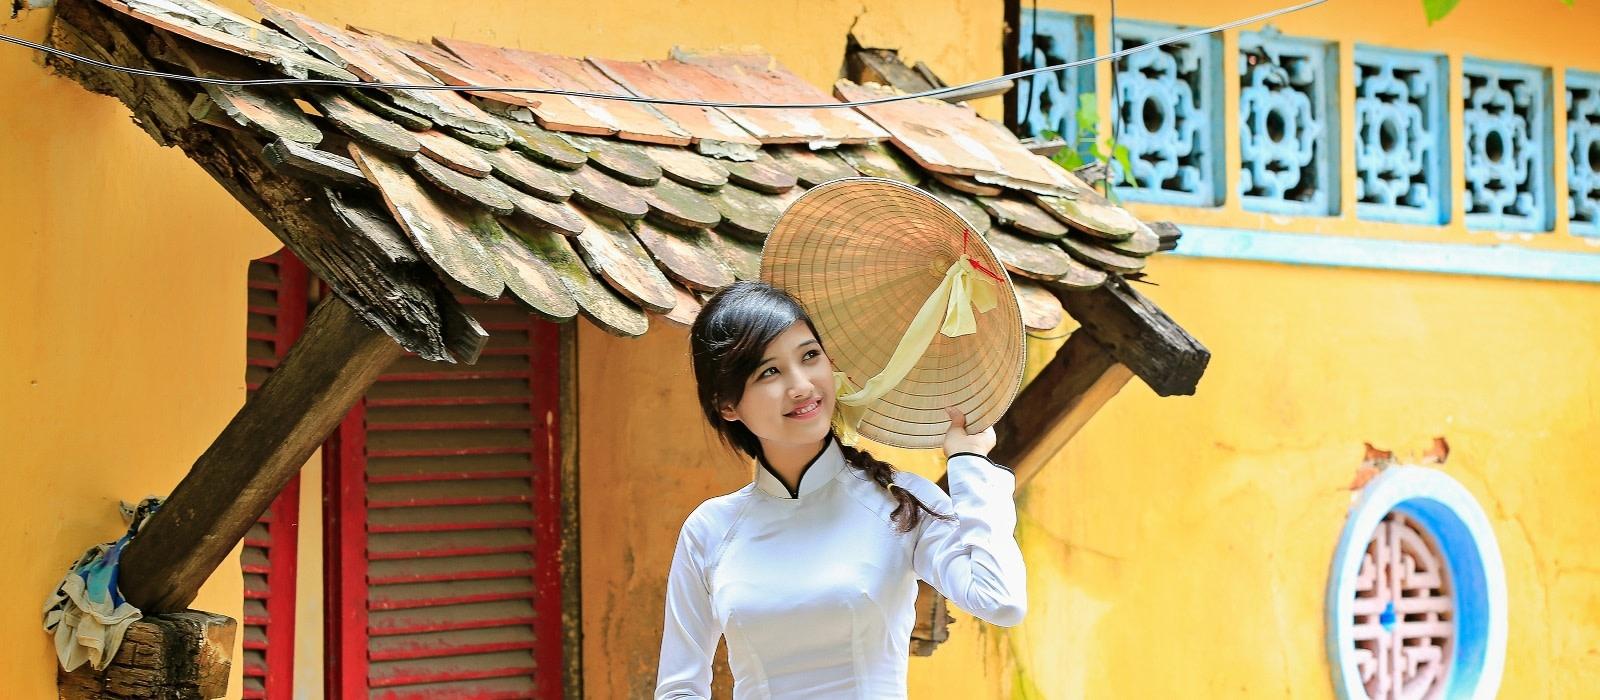 Vietnam & Cambodia: Cruising the Mekong River Tour Trip 1